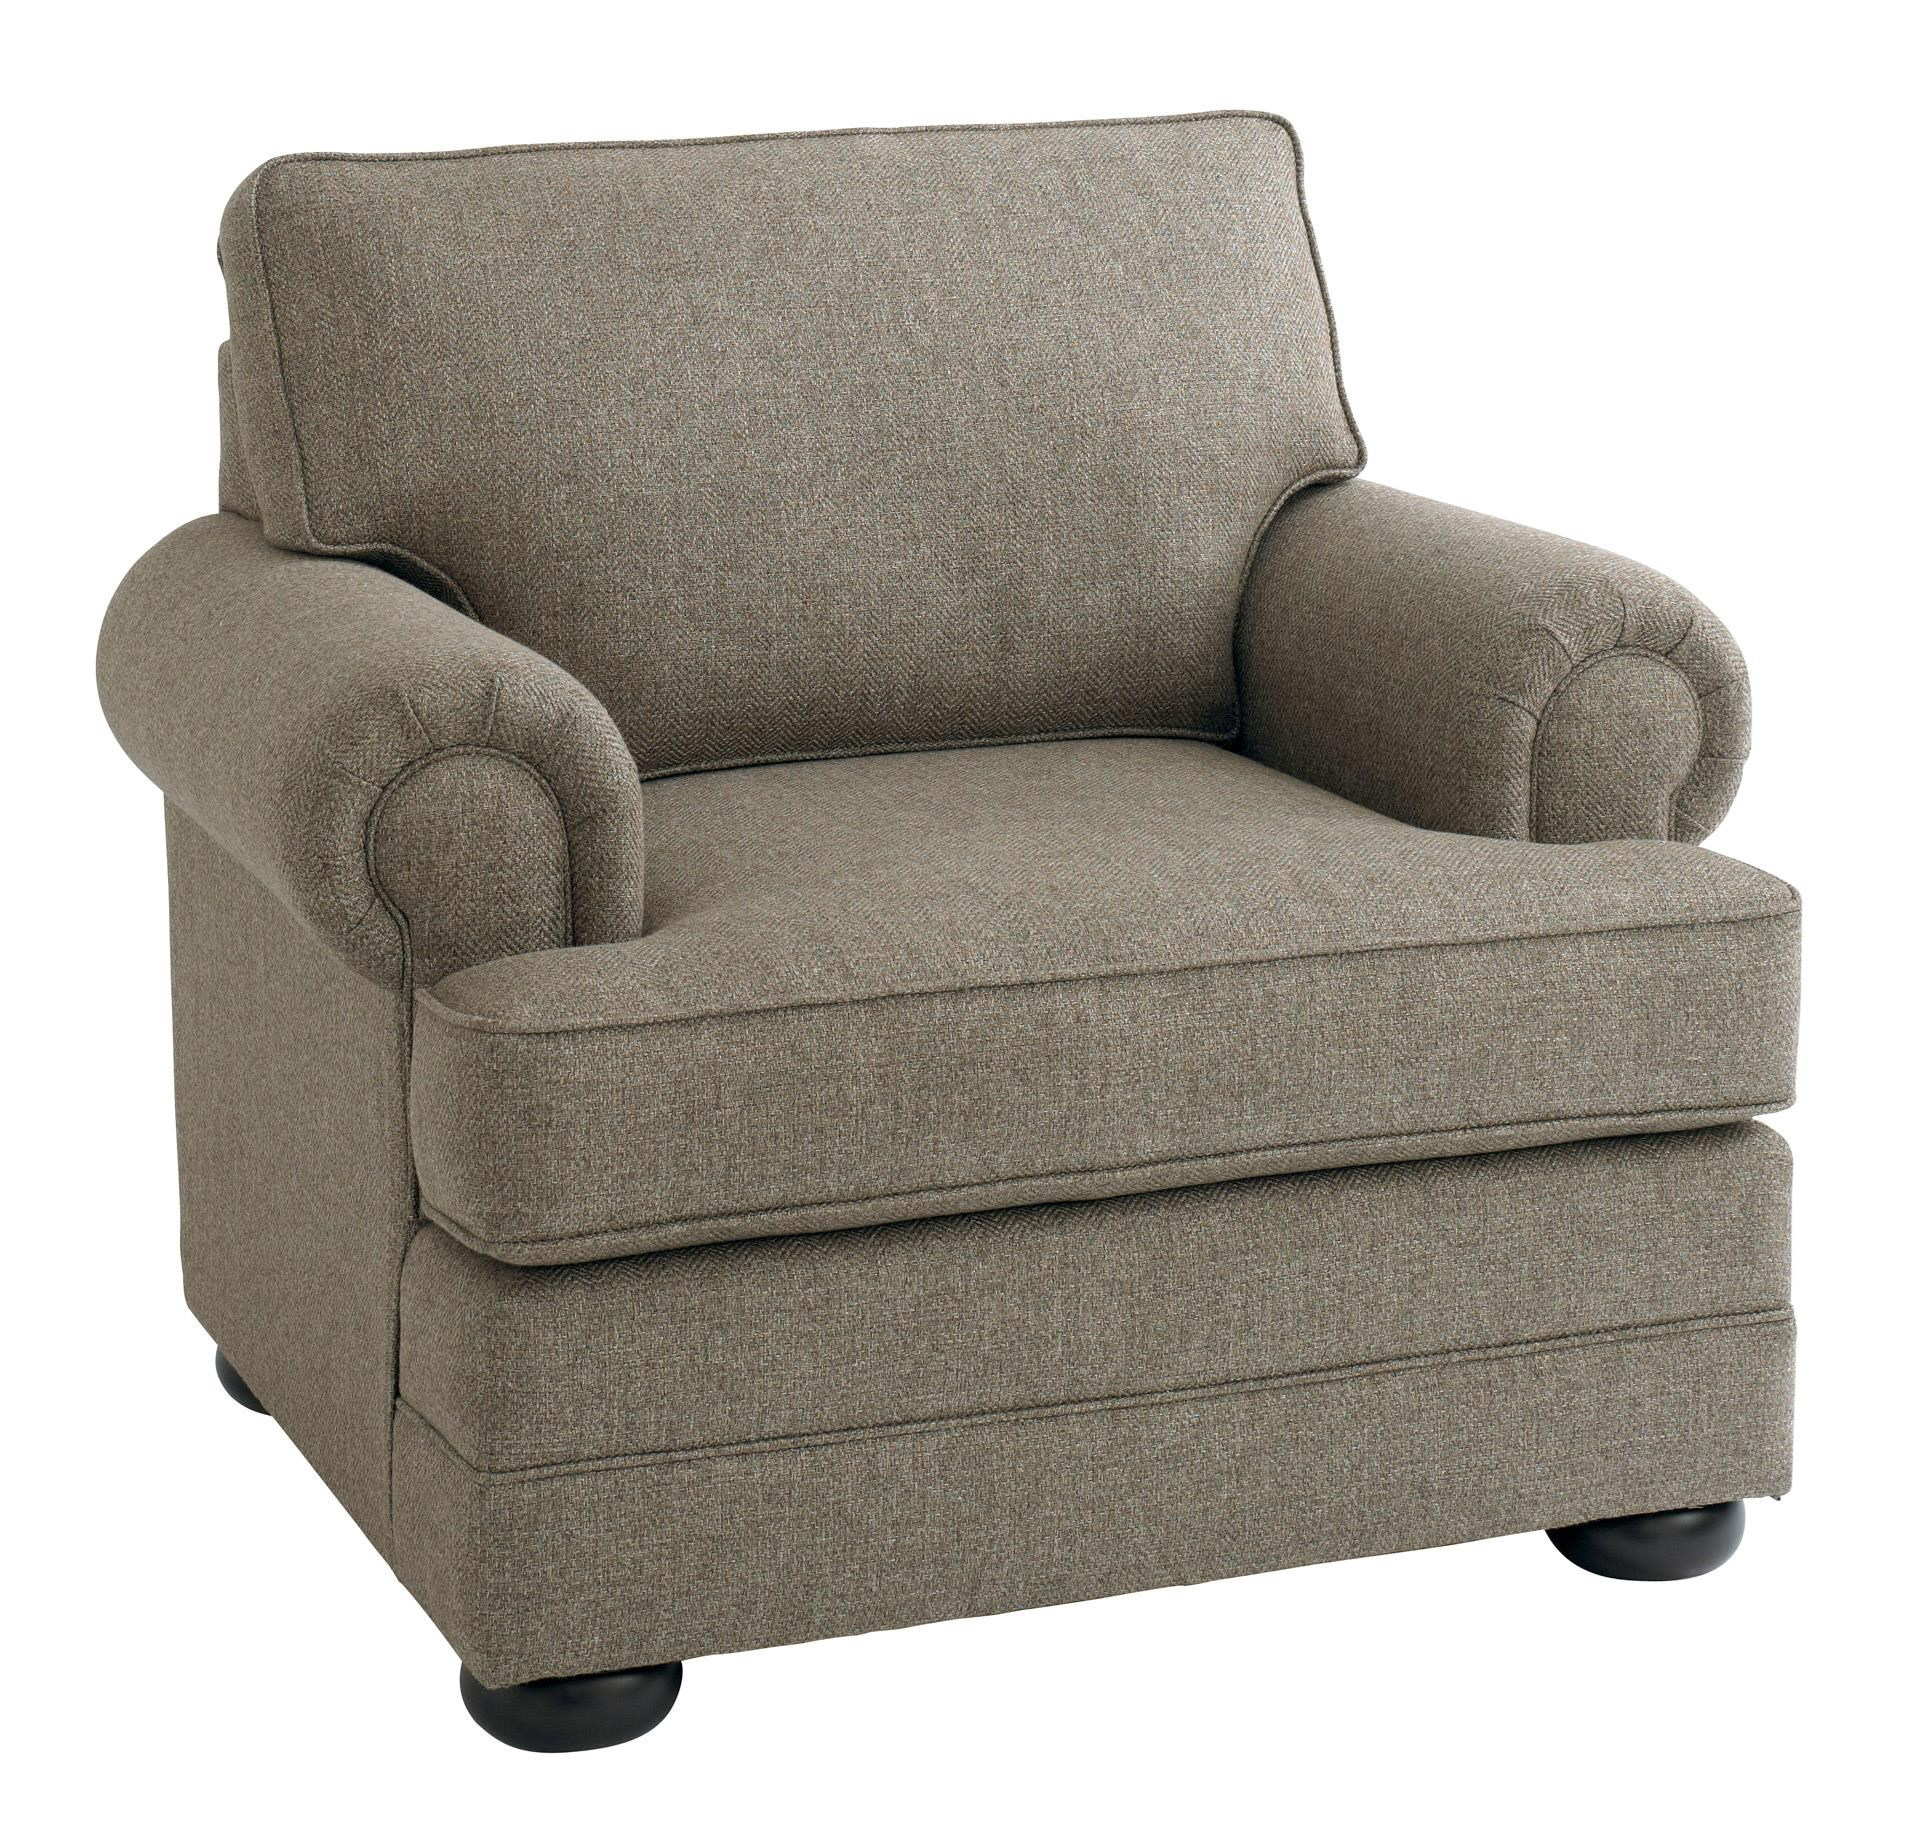 Bassett Hyde Park Chair - Item Number: 3913-12FC-1523-8